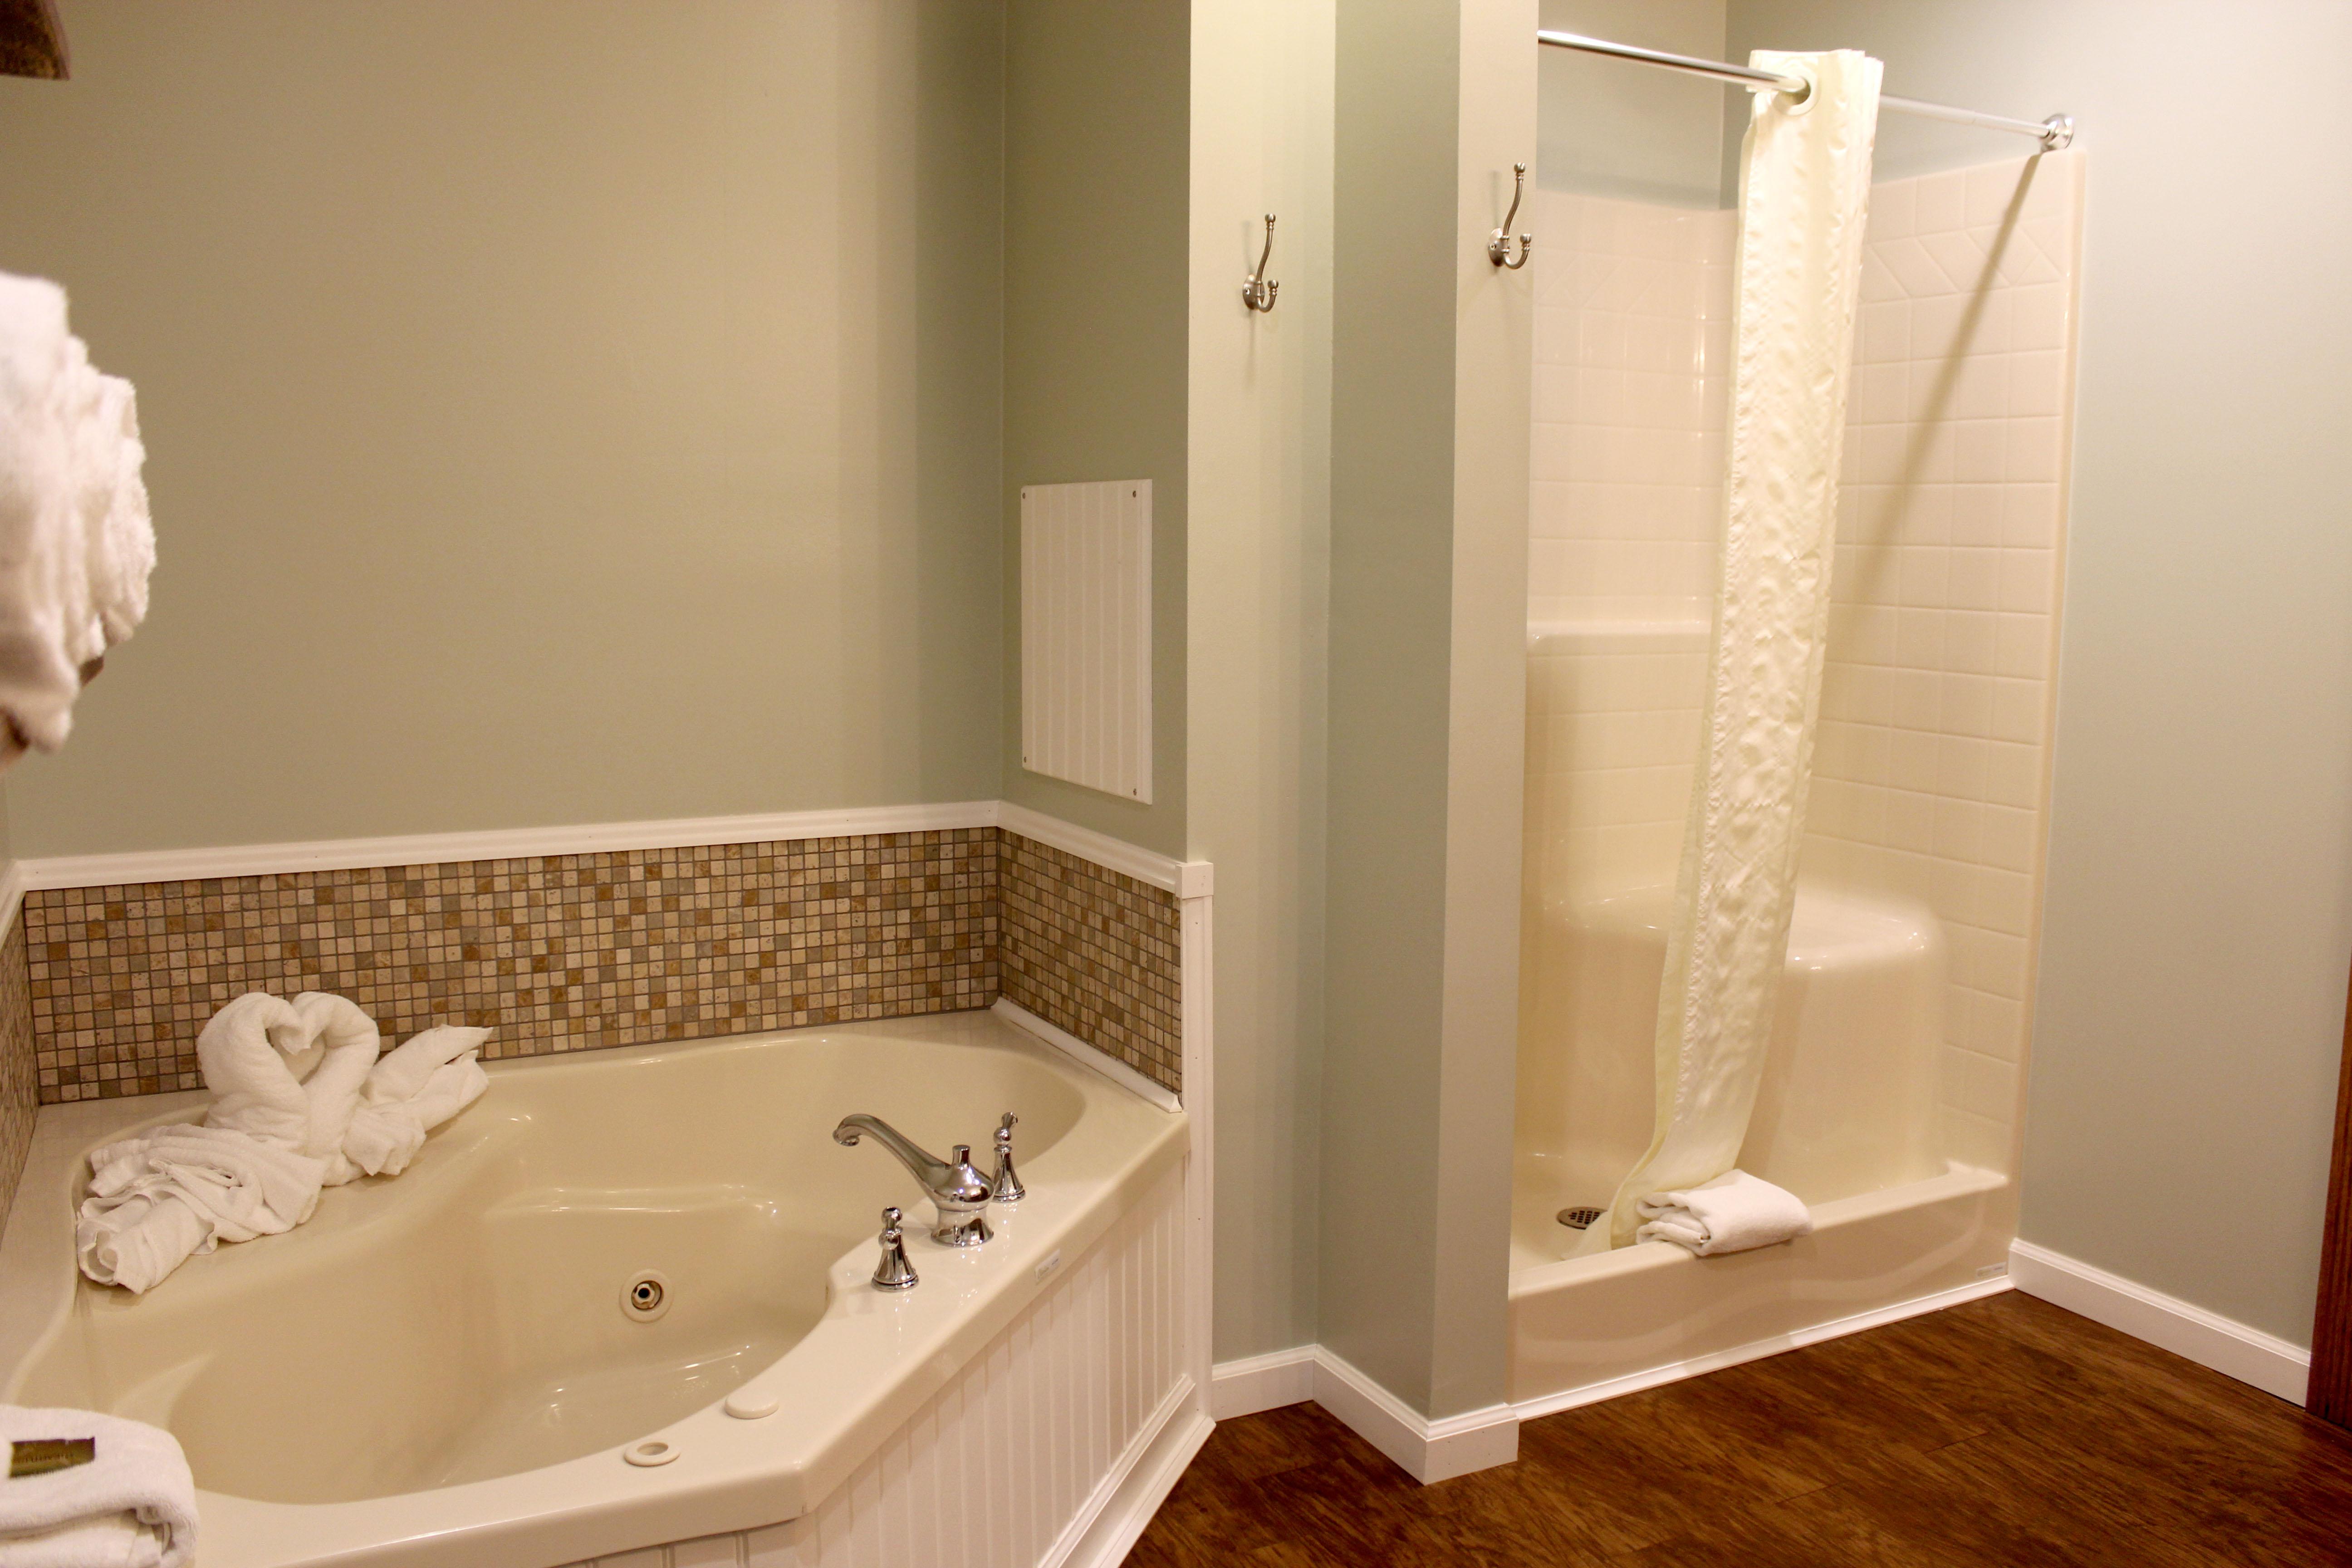 jacuzzi-tub-shower